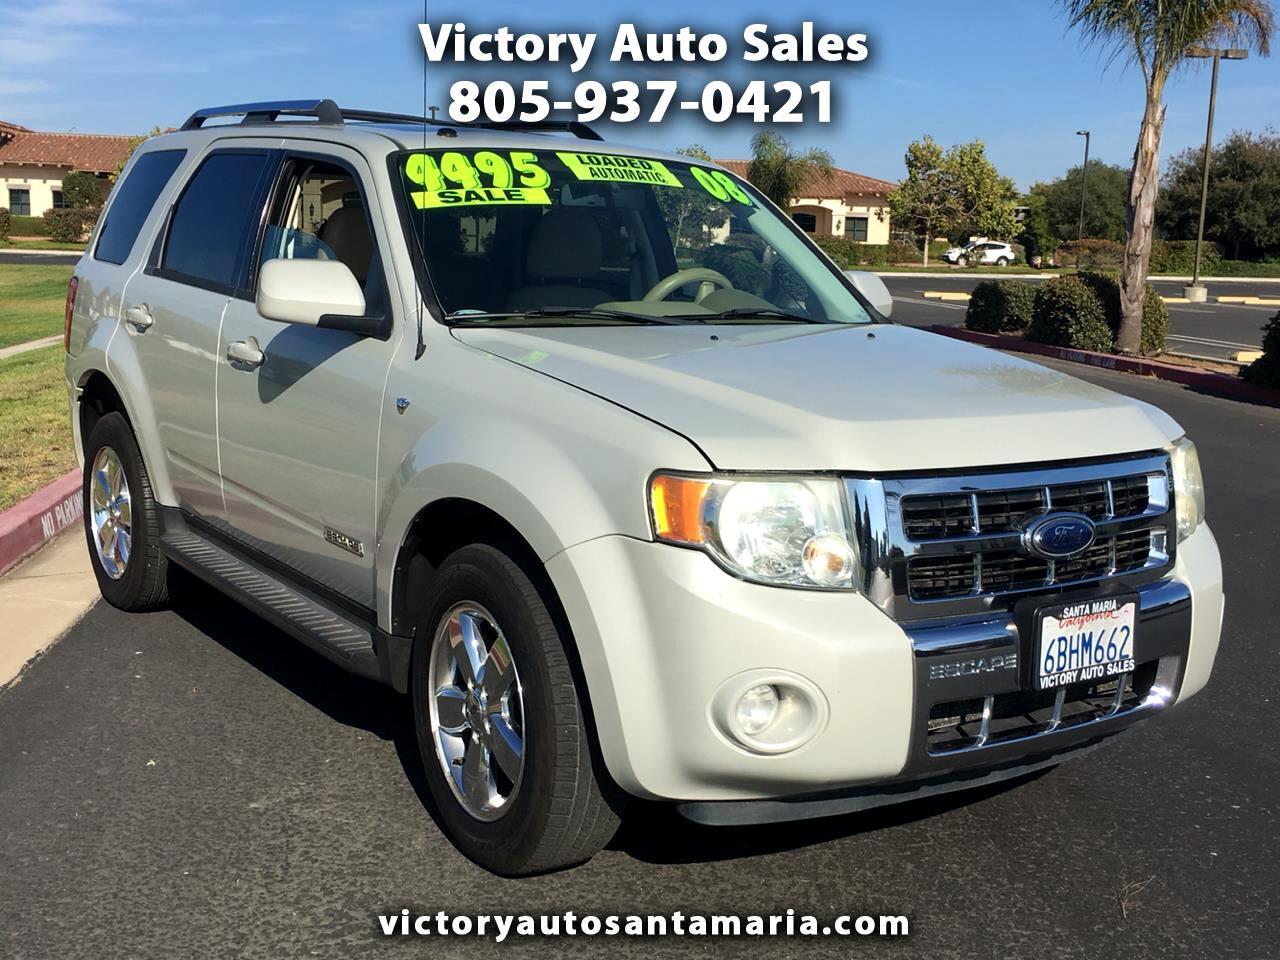 Victory Auto Sales >> Used Cars For Sale Santa Maria Ca 93455 Victory Auto Sales